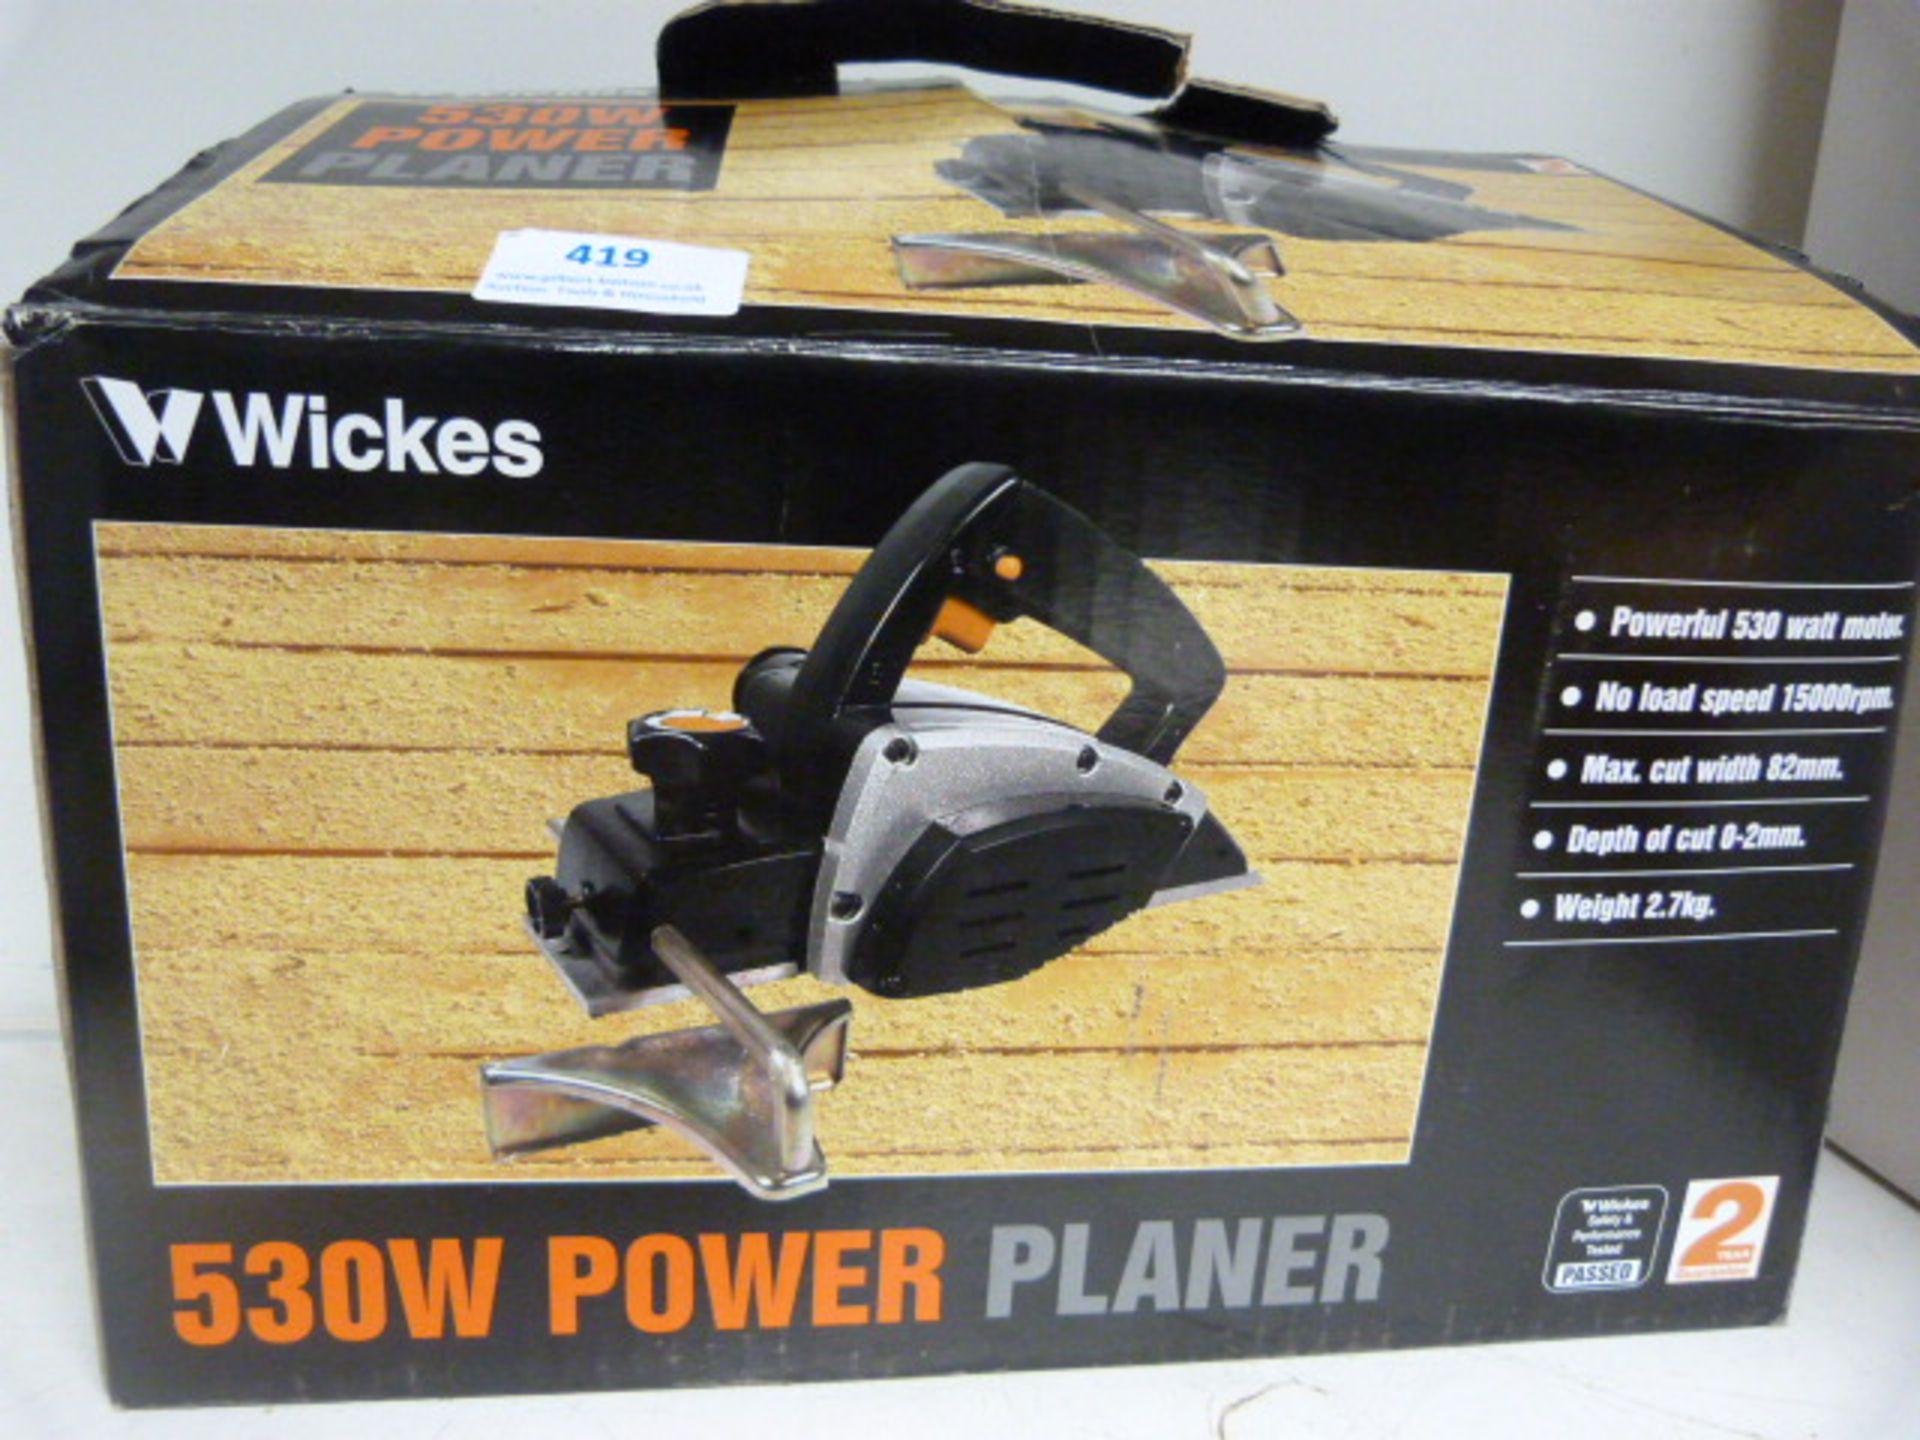 Lot 419 - 530w Power Planer